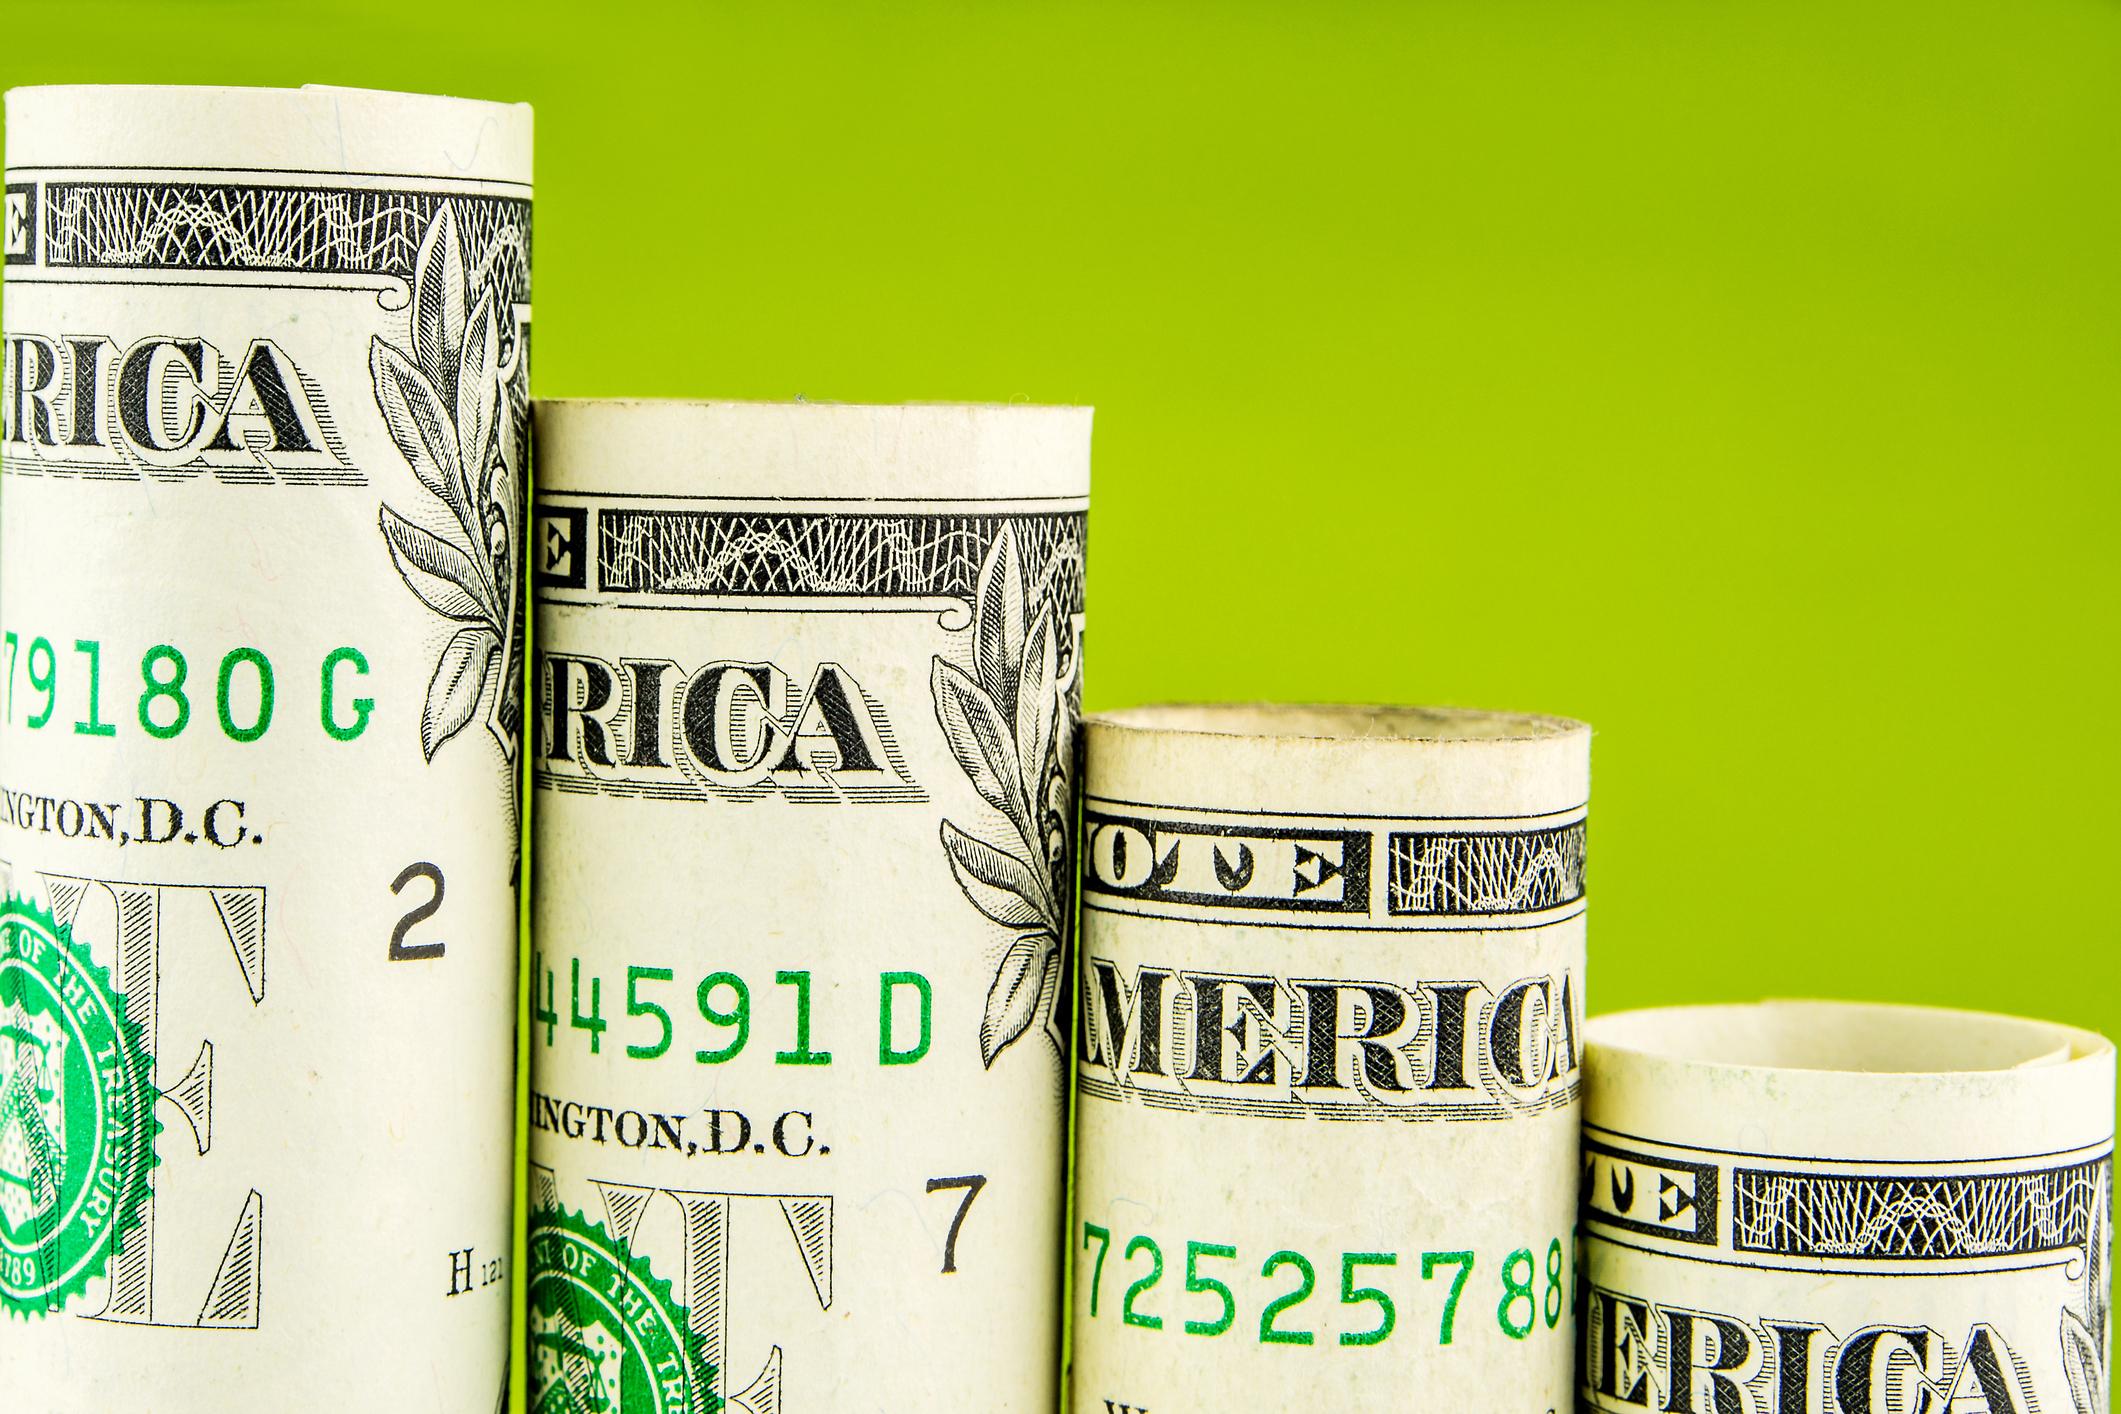 Rolled-up dollar bills